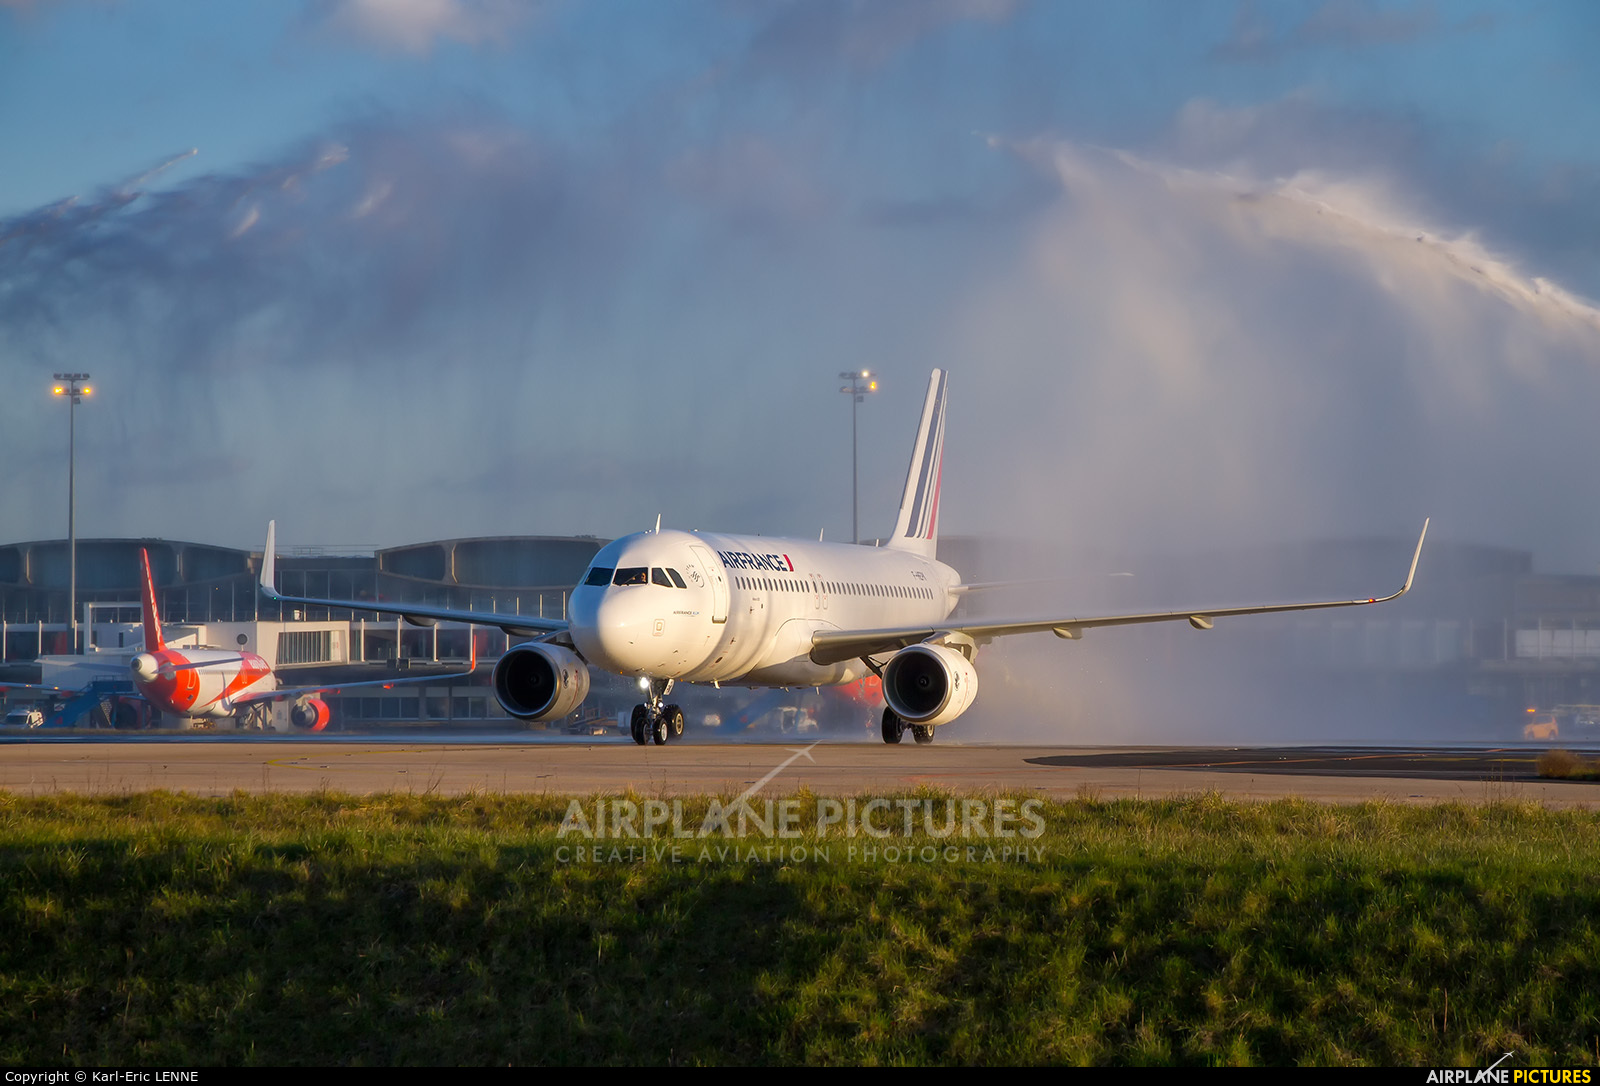 Air France F-HEPK aircraft at Paris - Charles de Gaulle